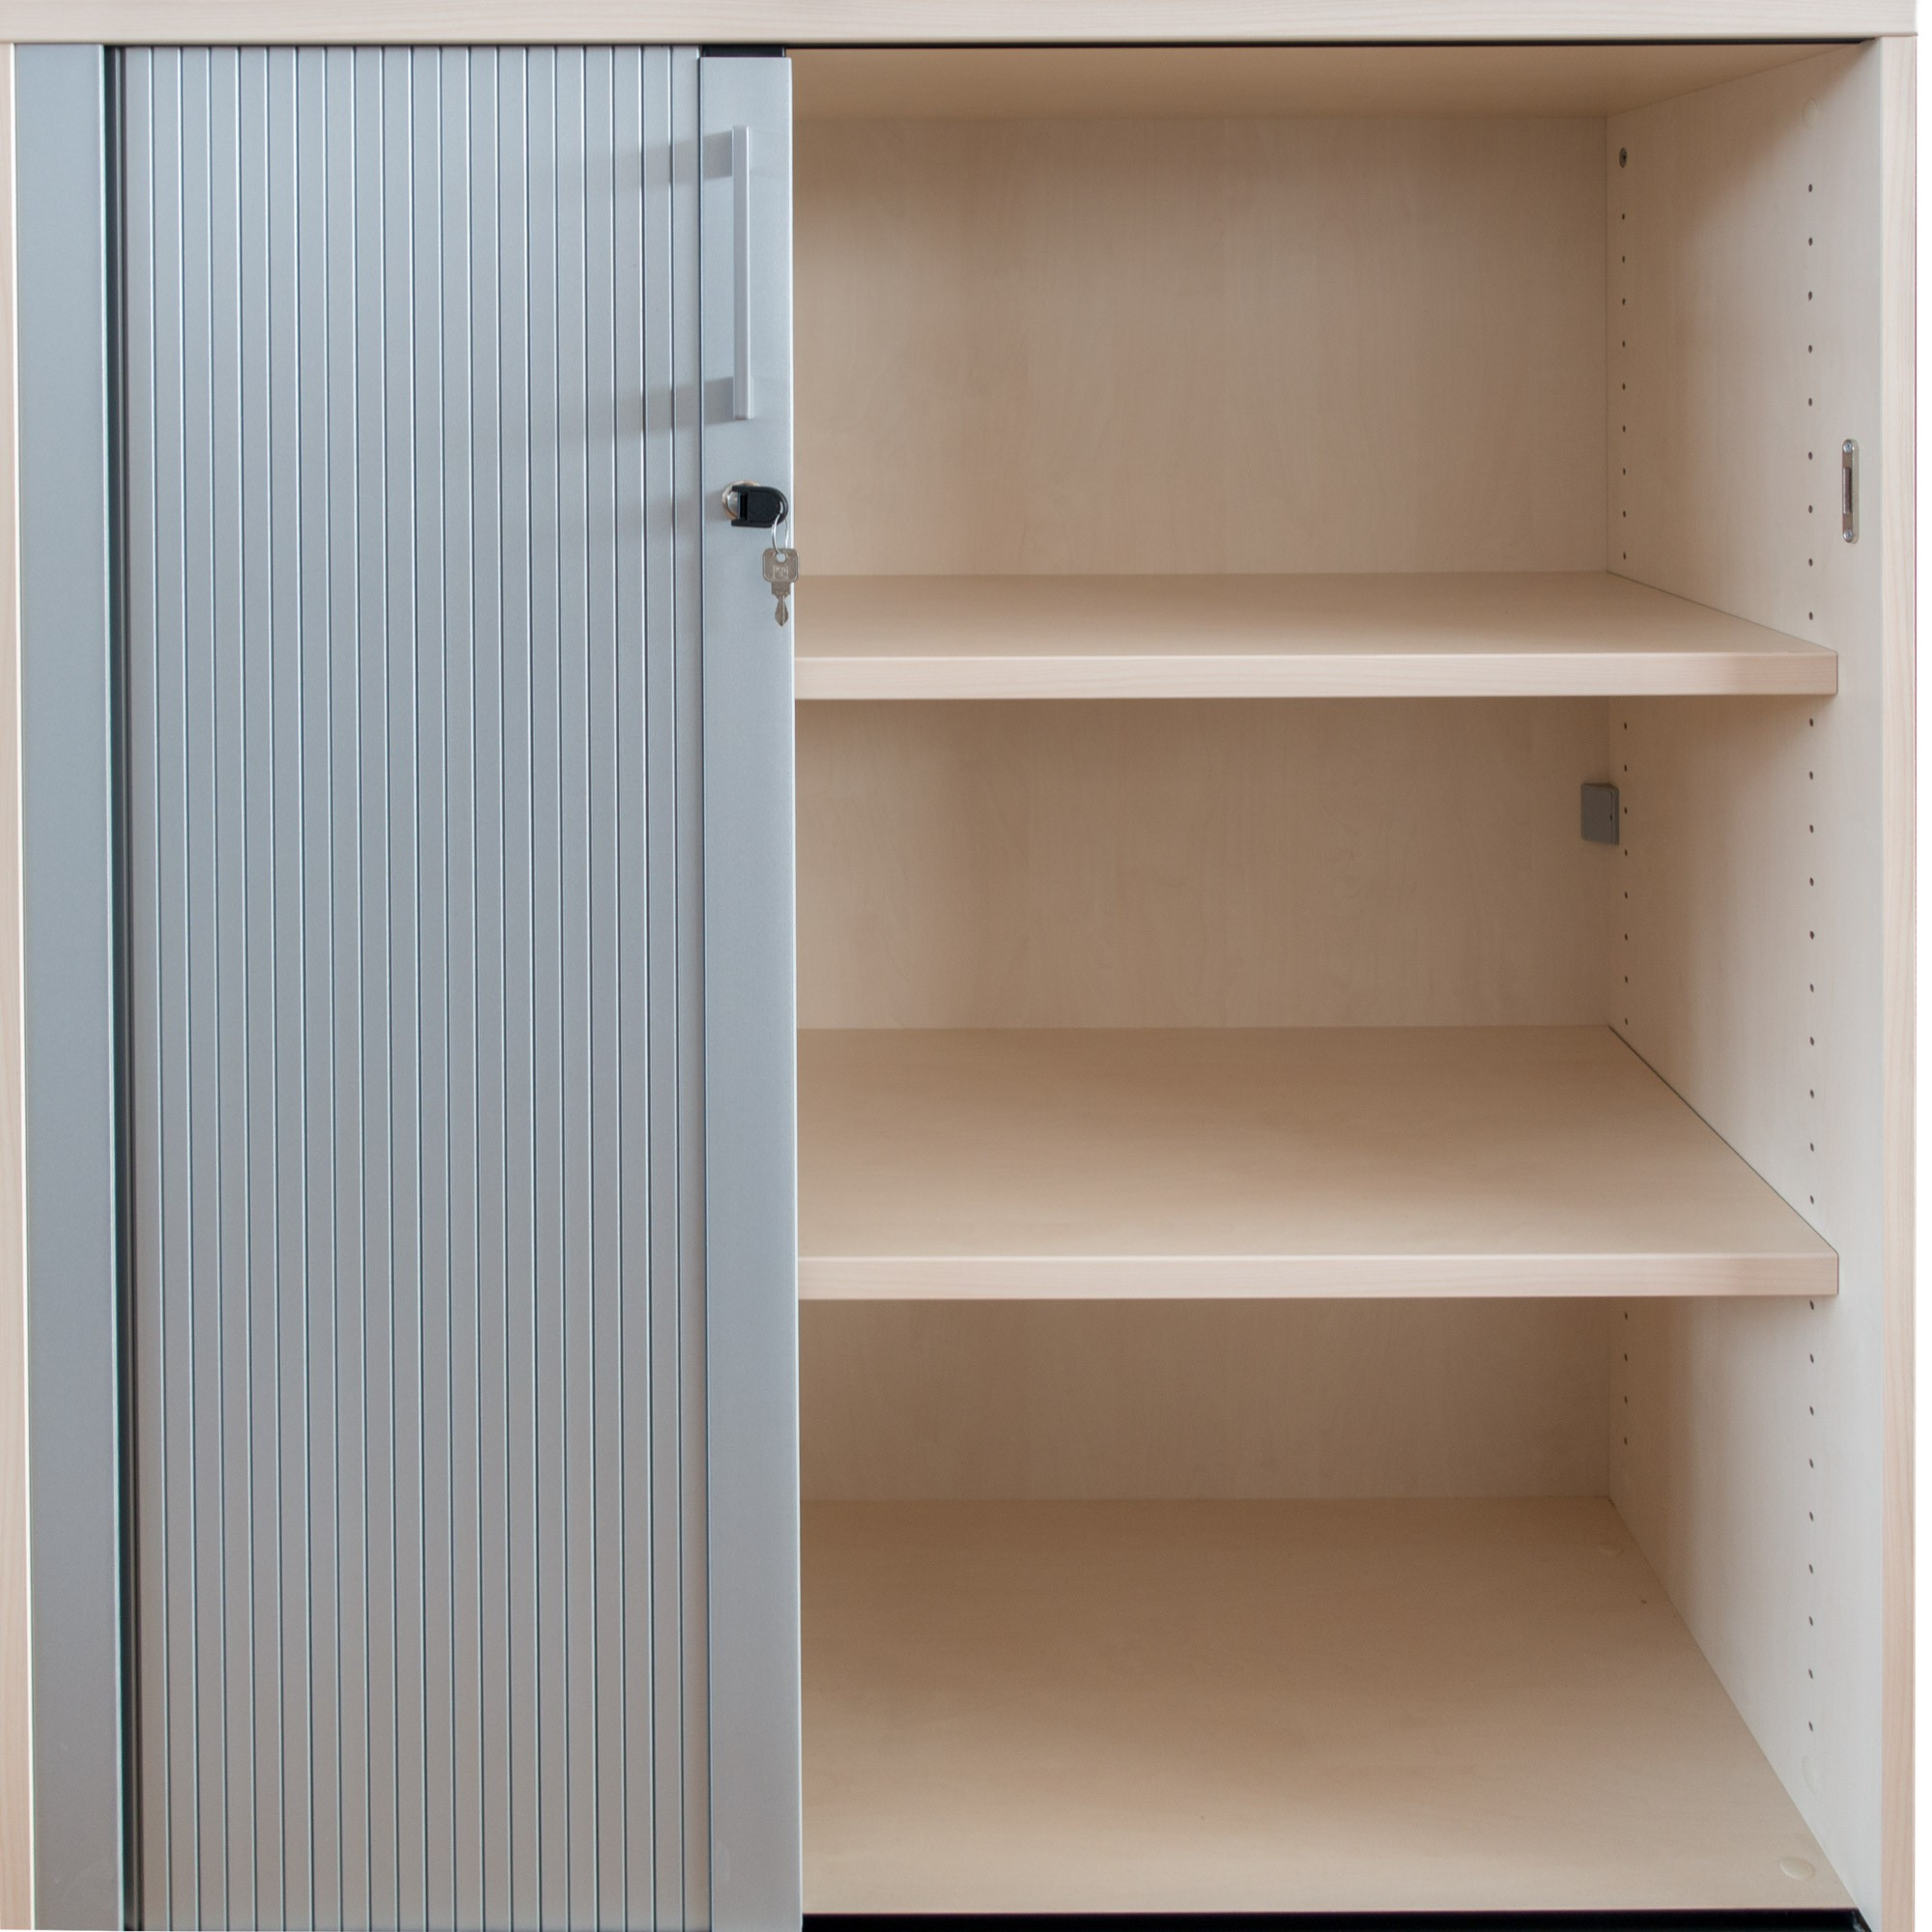 profi jalousieschrank ahorn silber 3oh 1 0m quer. Black Bedroom Furniture Sets. Home Design Ideas